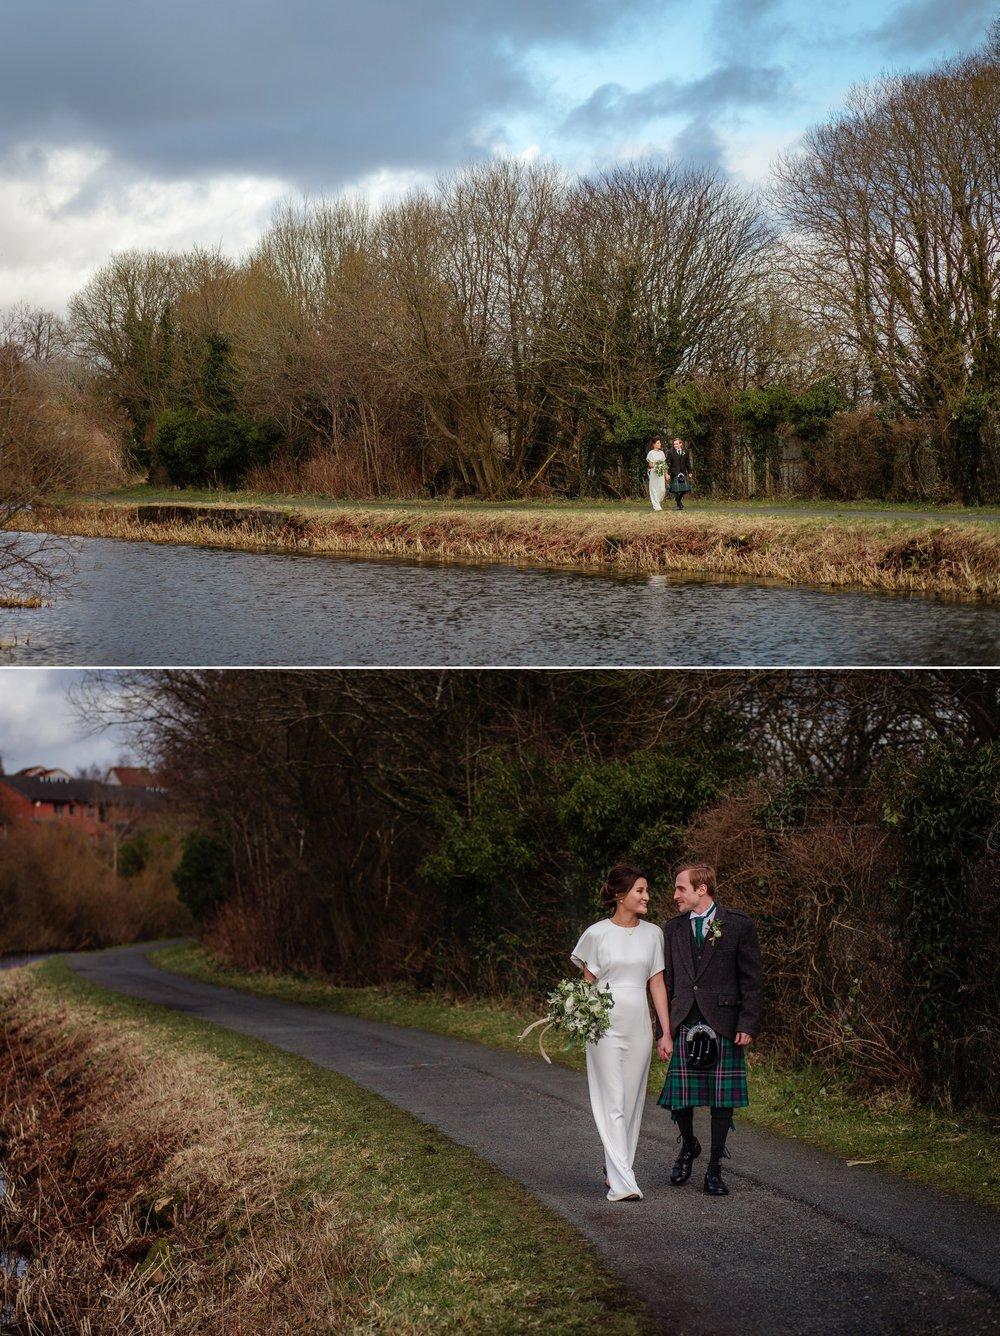 engine-works-wedding-styled-shoot-fotomaki-photography-177.jpg